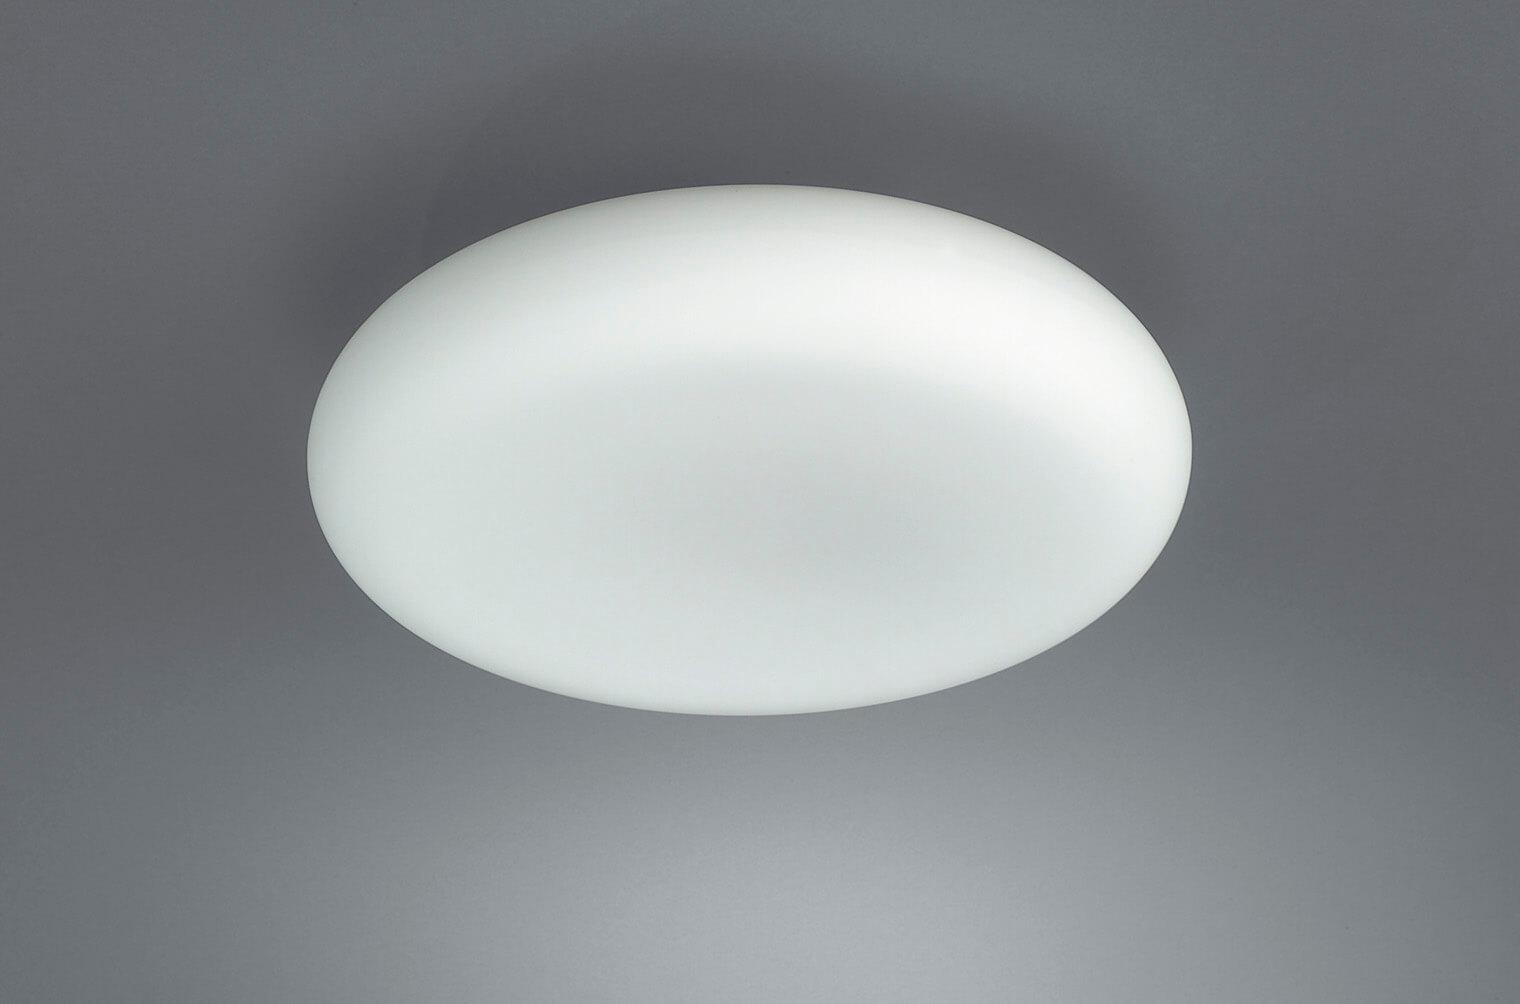 Aqua Ceiling Light 1520 x 1004